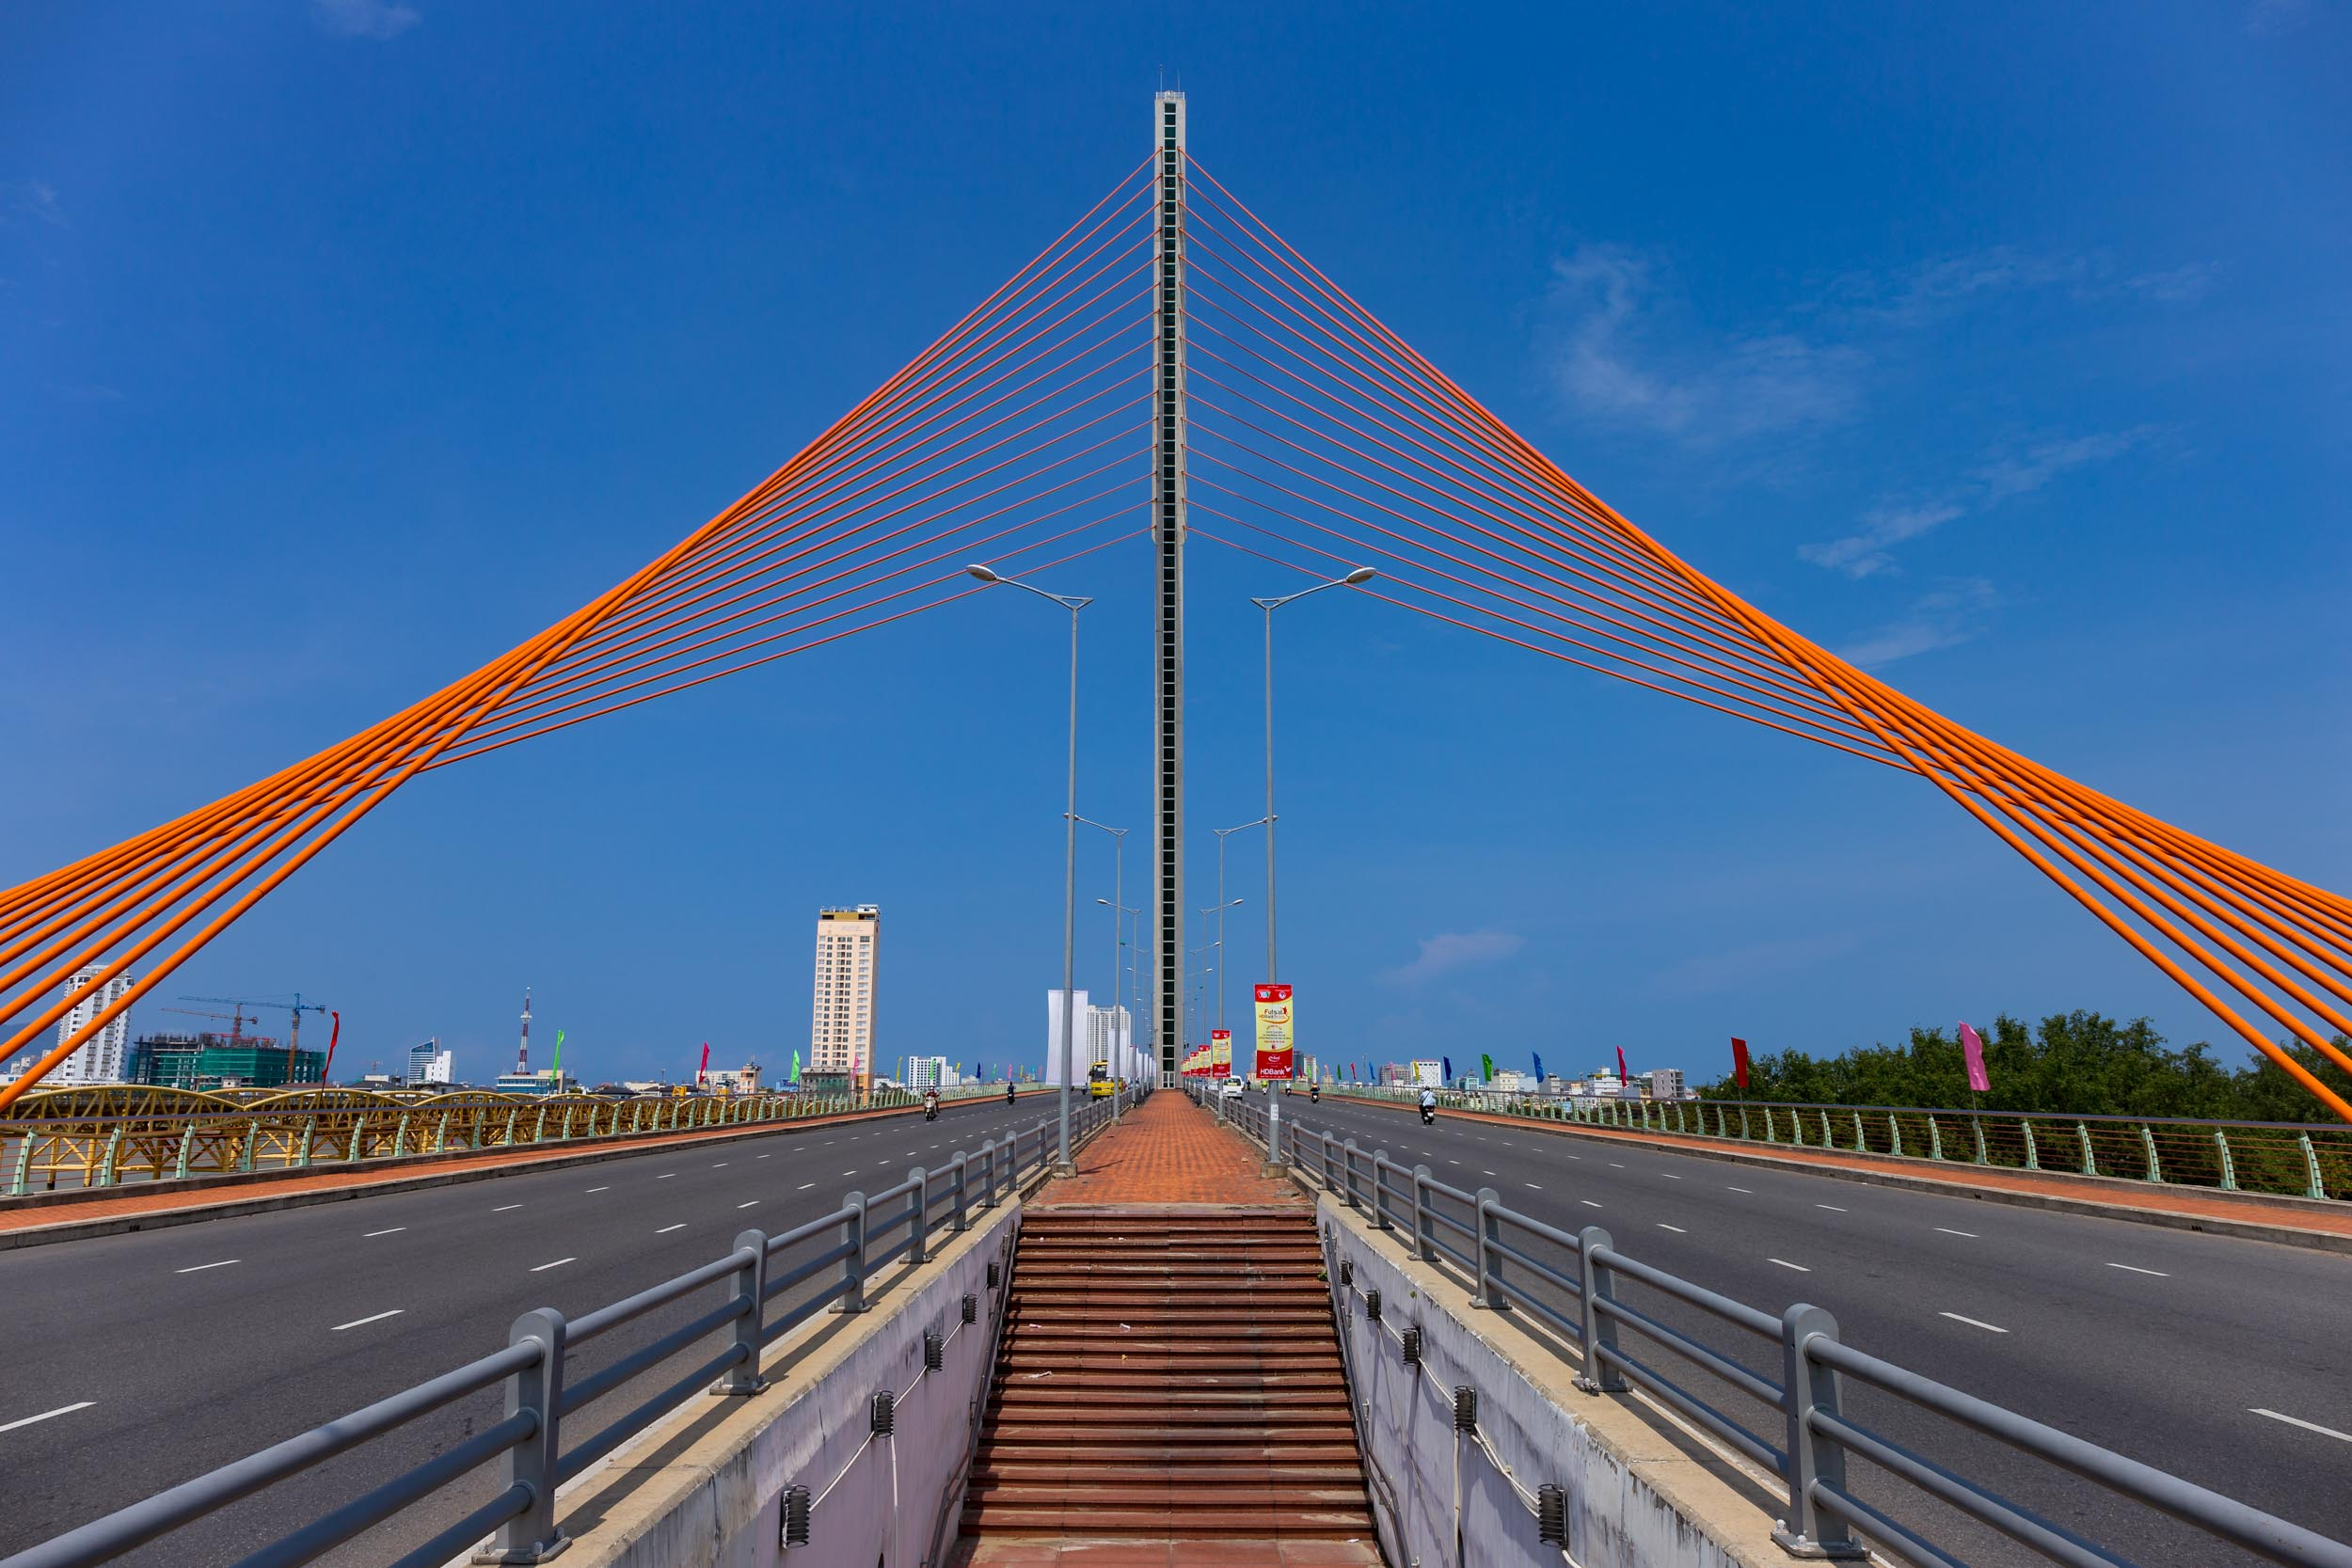 Suspension bridge Da Nang, Vietnam.